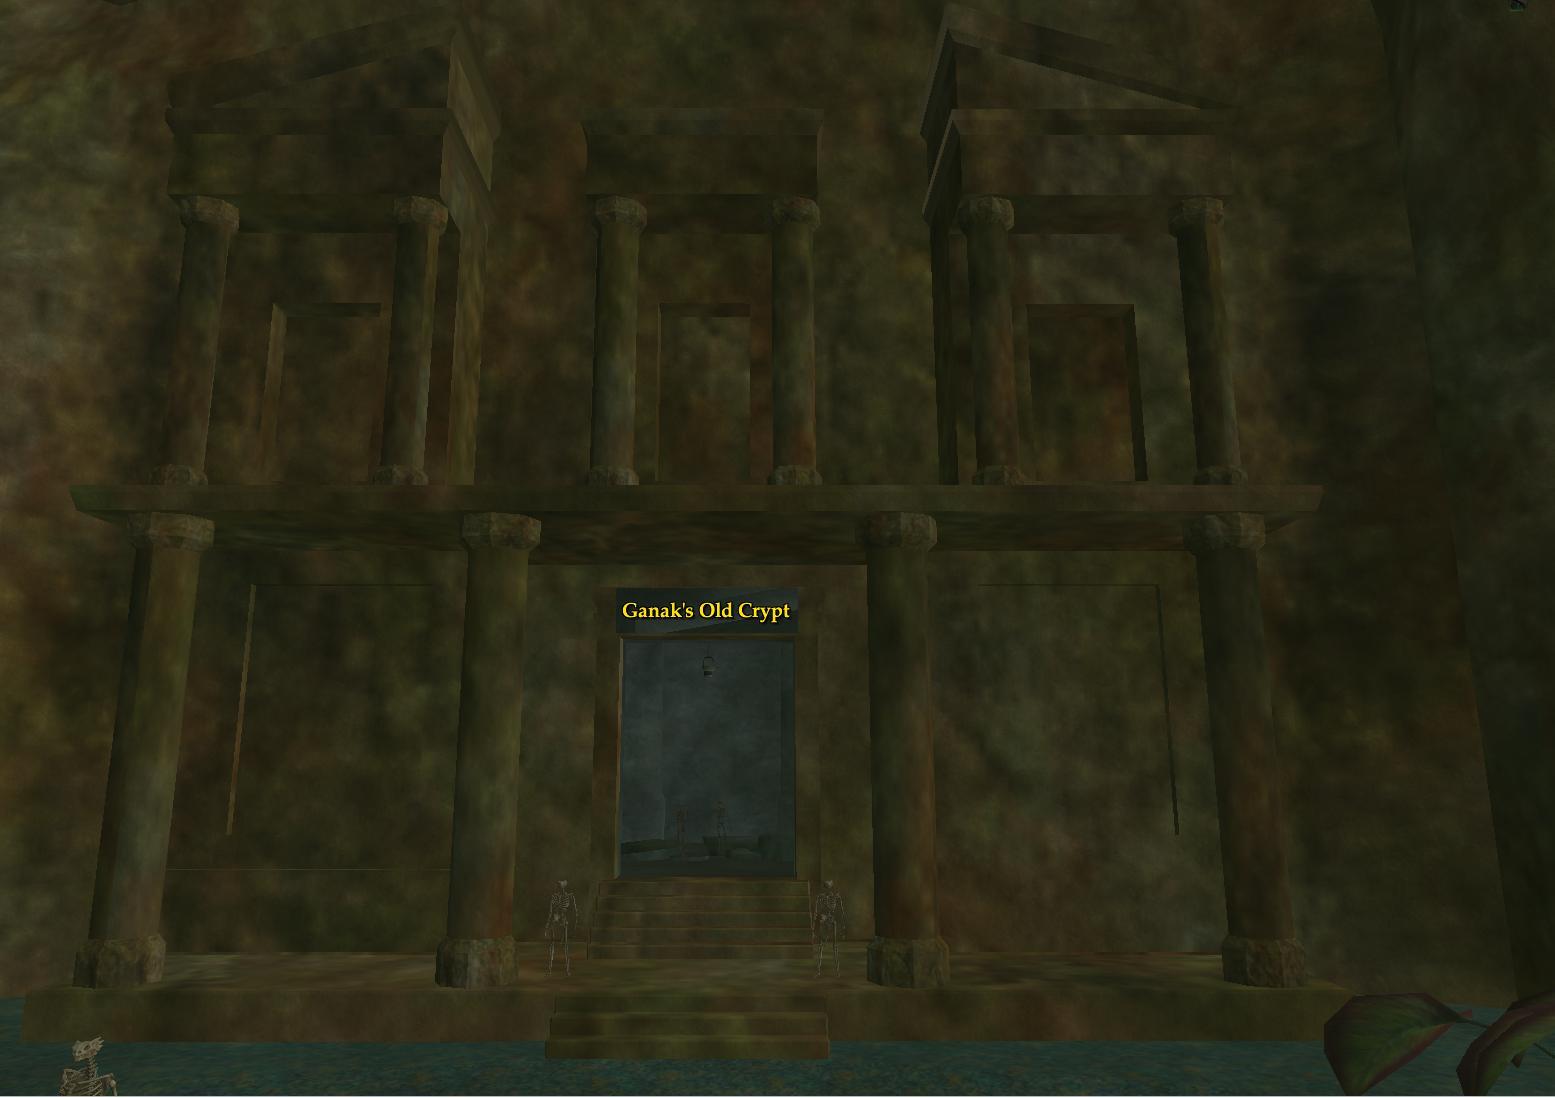 Ganak's Old Crypt